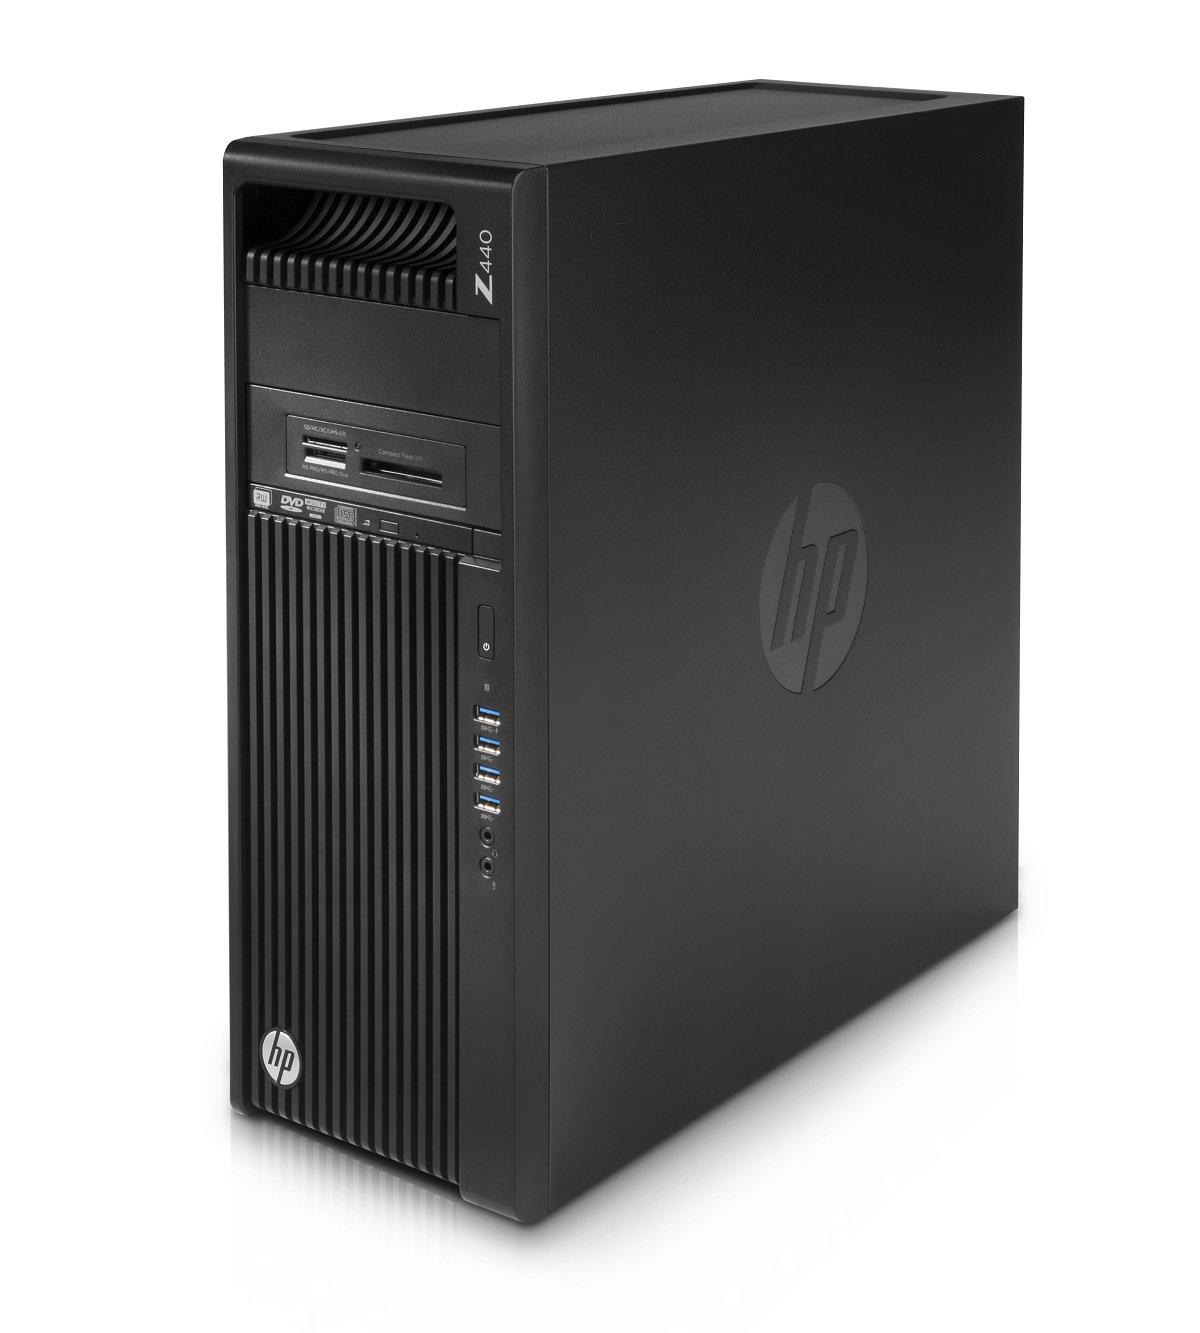 HP Z440 Xeon E5-1620v4 4c, 700W zdroj, 1TB, 2x8GB DDR4-2400 ECC,DVDRW, no VGA, no keyb, USB laser mouse, Win10Pro